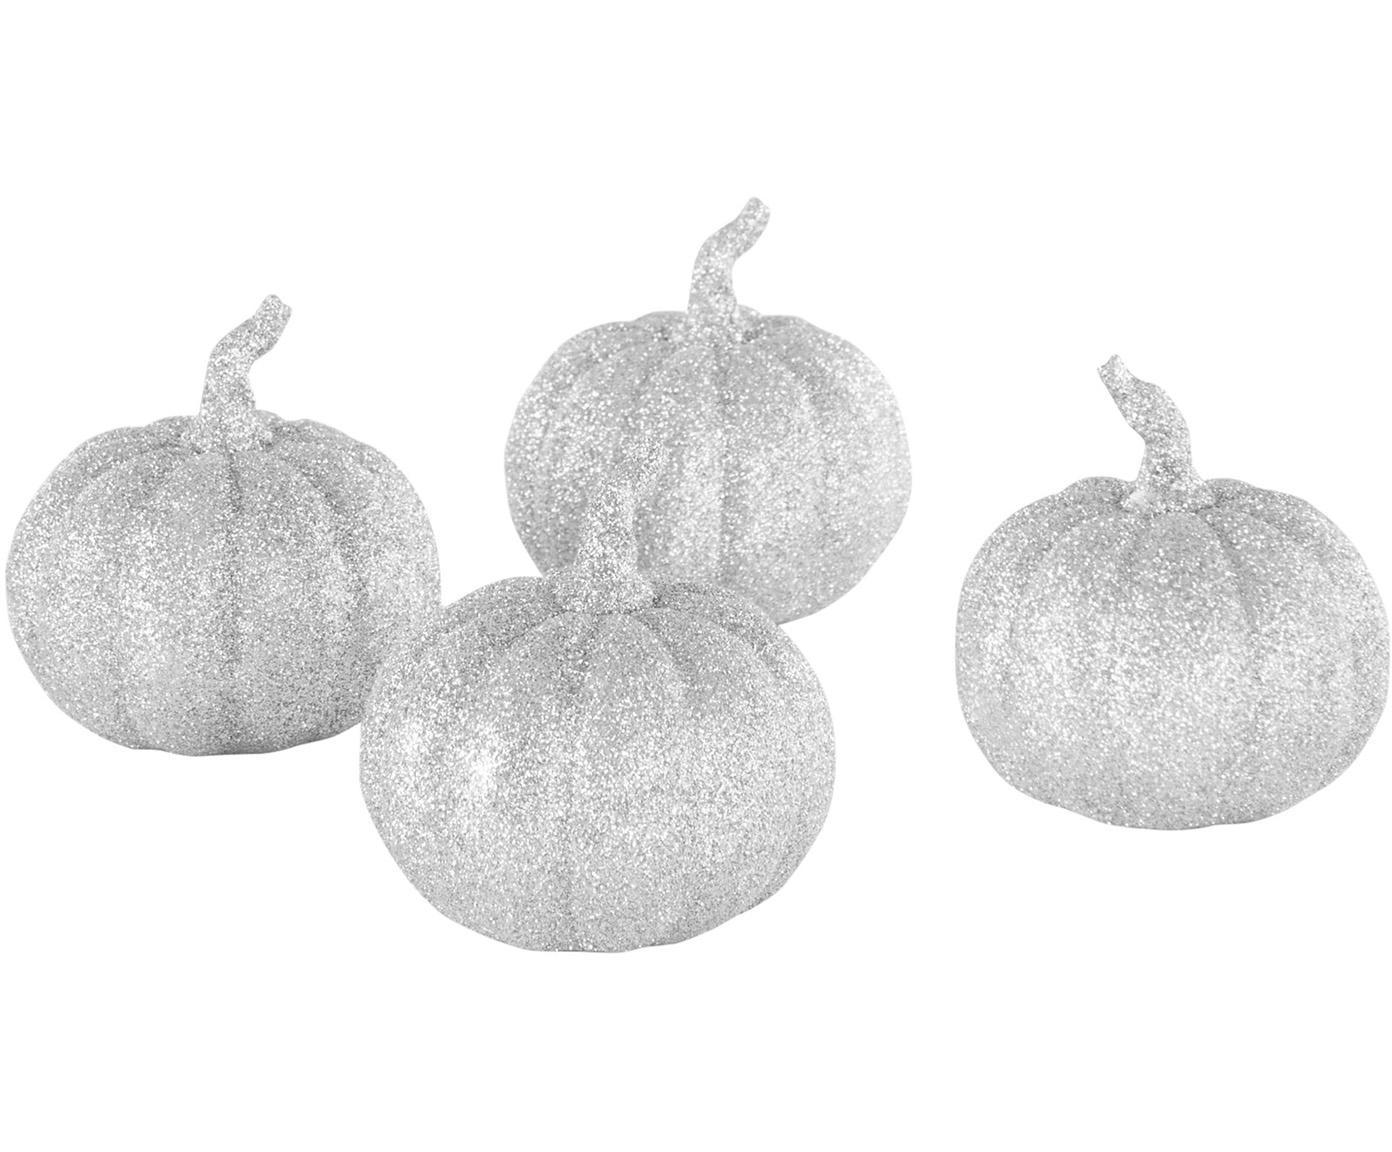 Deko-Kürbis-Set Dixie, 4-tlg., Kunstfaser, Silber, Ø 9 x H 9 cm